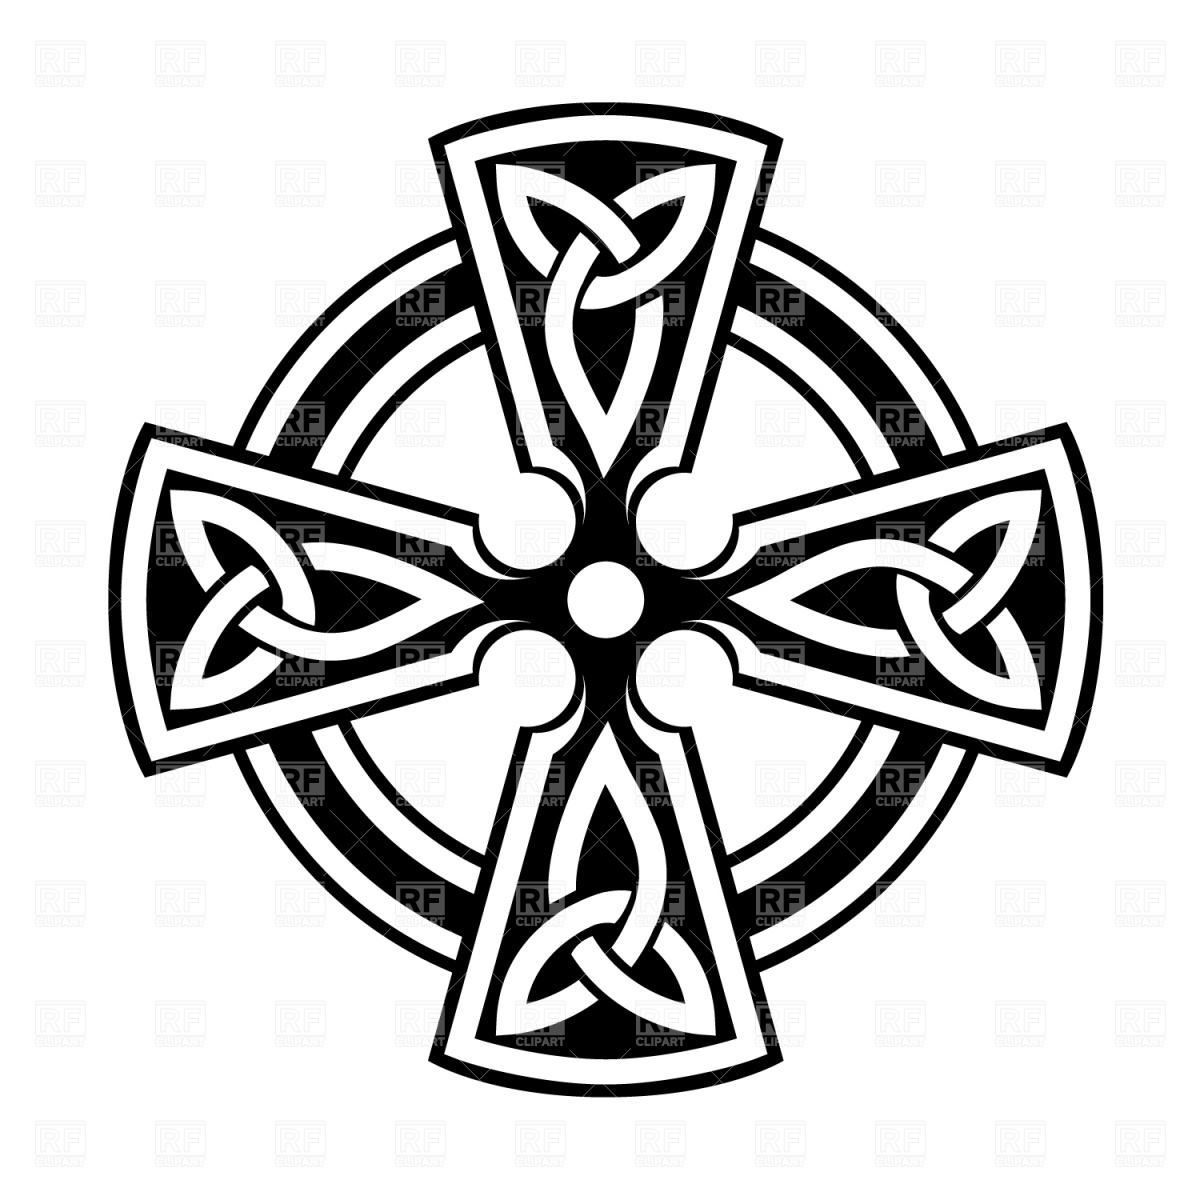 Celtic clipart free image Simple Celtic Cross Clip Art   Clipart Panda - Free Clipart Images image